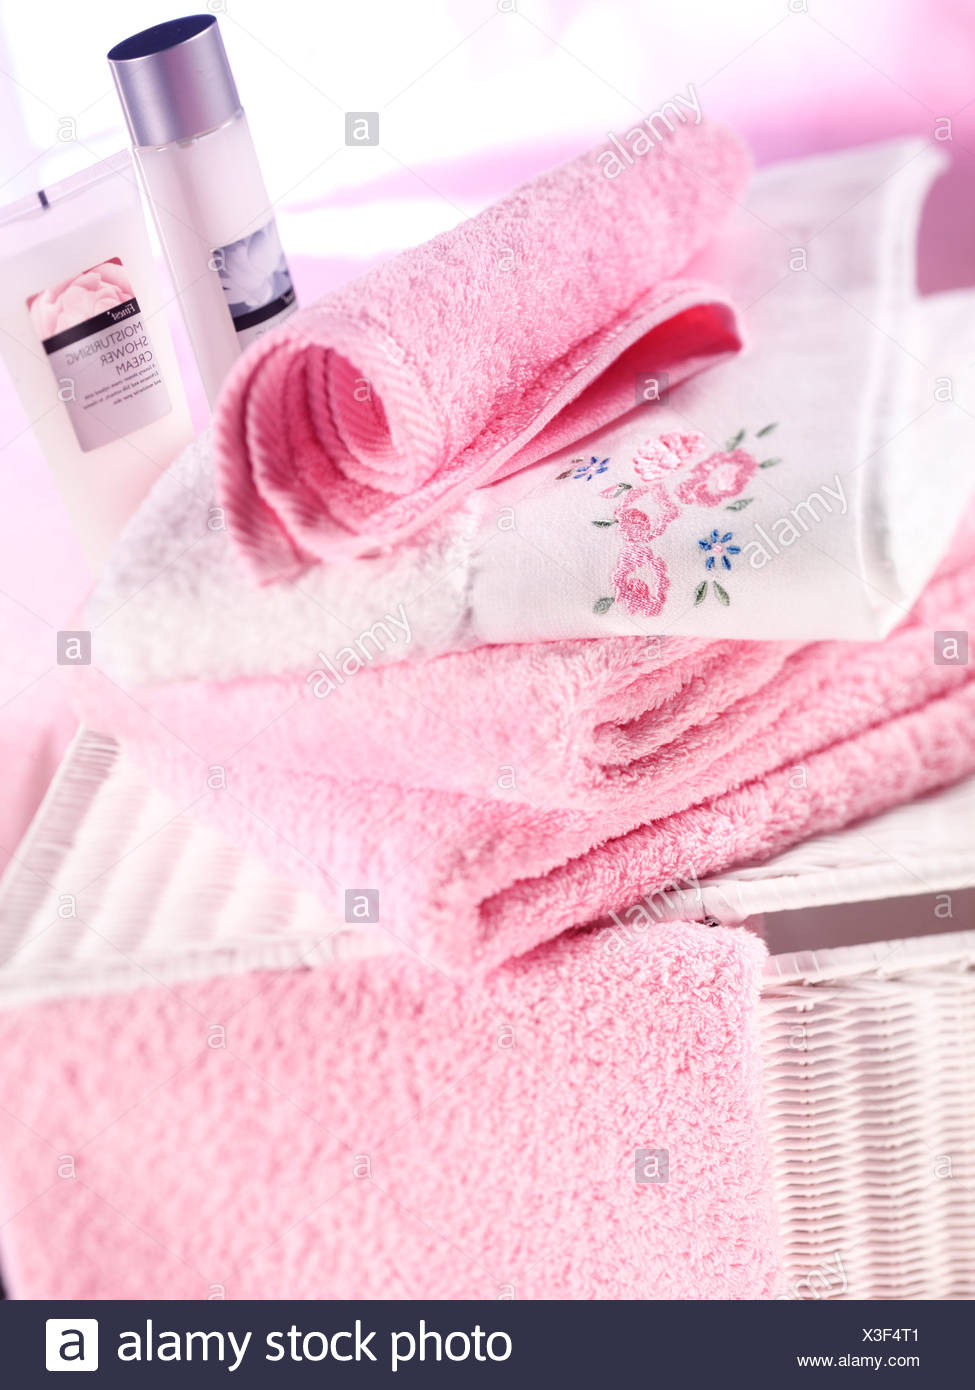 pink bathroom towels - Pink Bathroom Towels